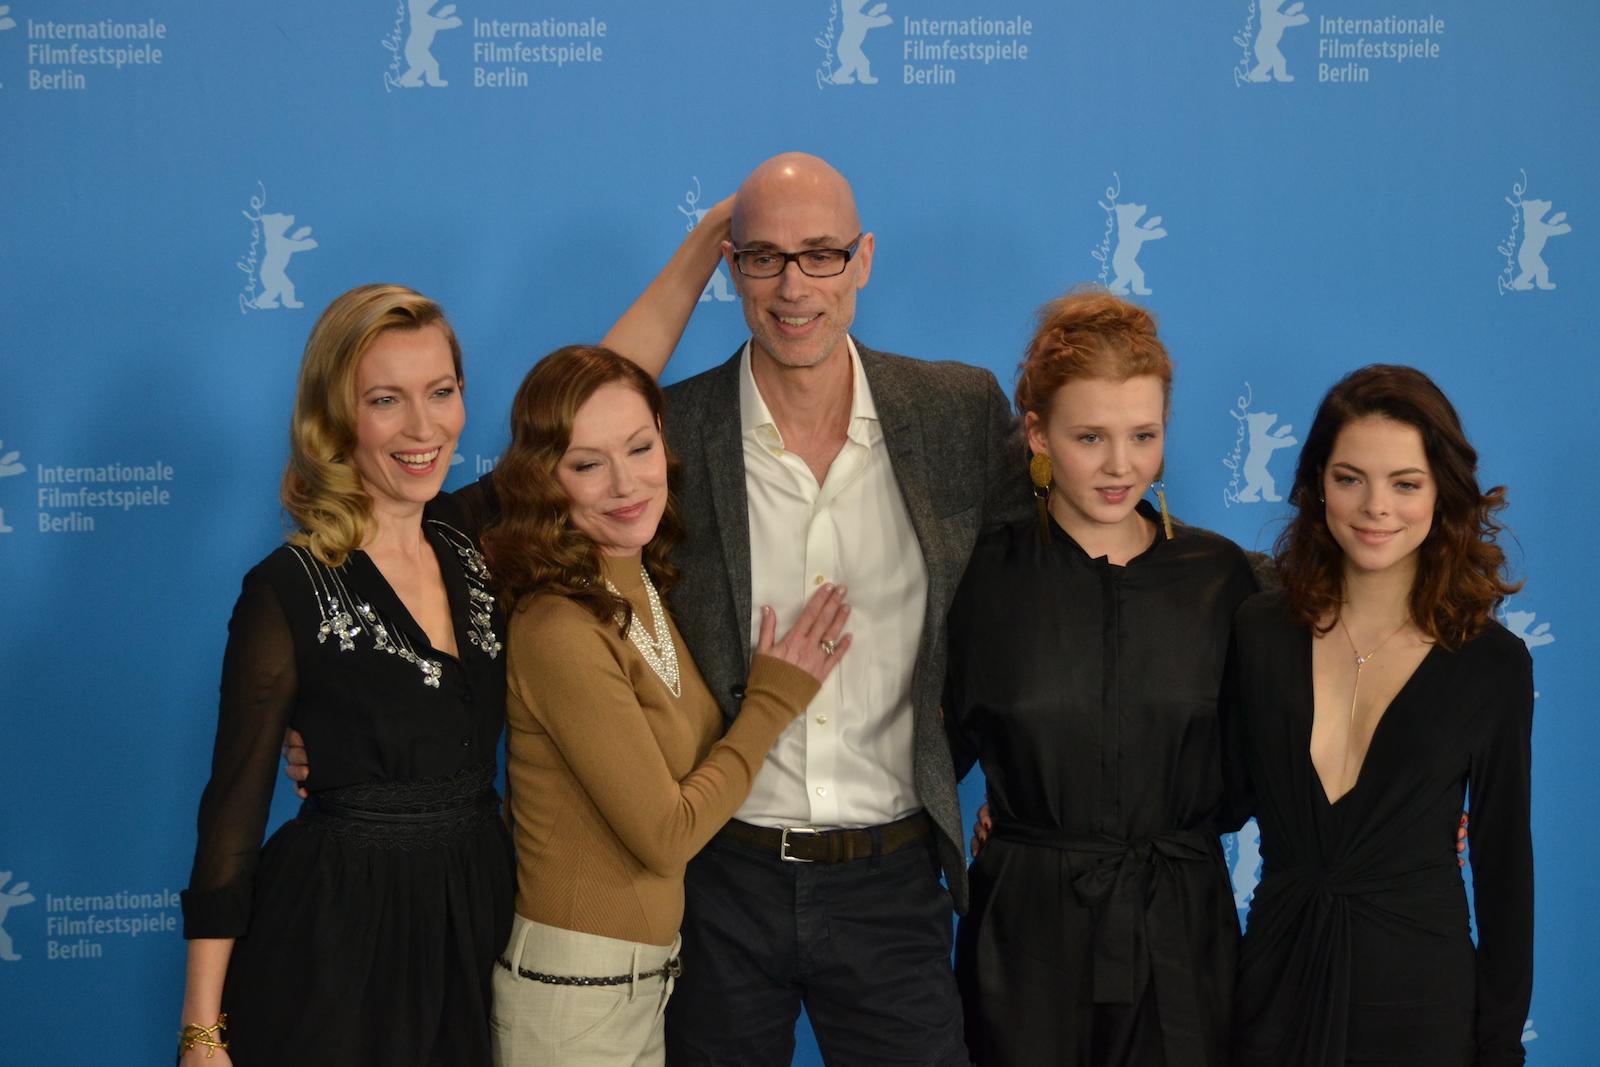 Berlino 2016: James Hyndman, Laetitia Isambert, Simone-Elise Girard, Isolda Dychauk al photocall di Boris without Béatrice